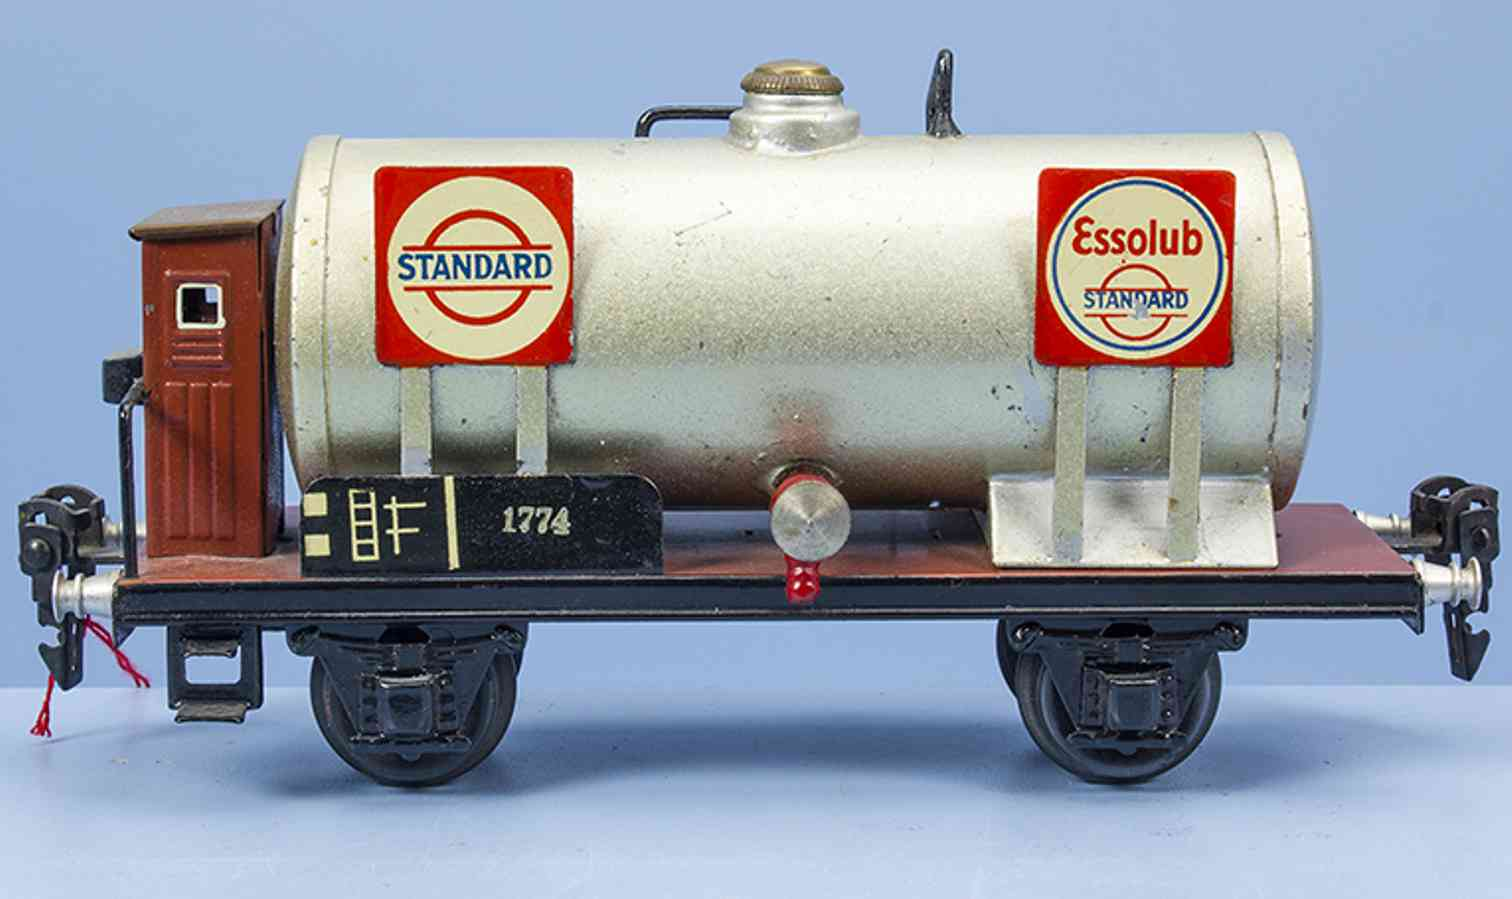 maerklin 1774/0 st 1938 eisenbahn kesselwagen standard essolub spur 0